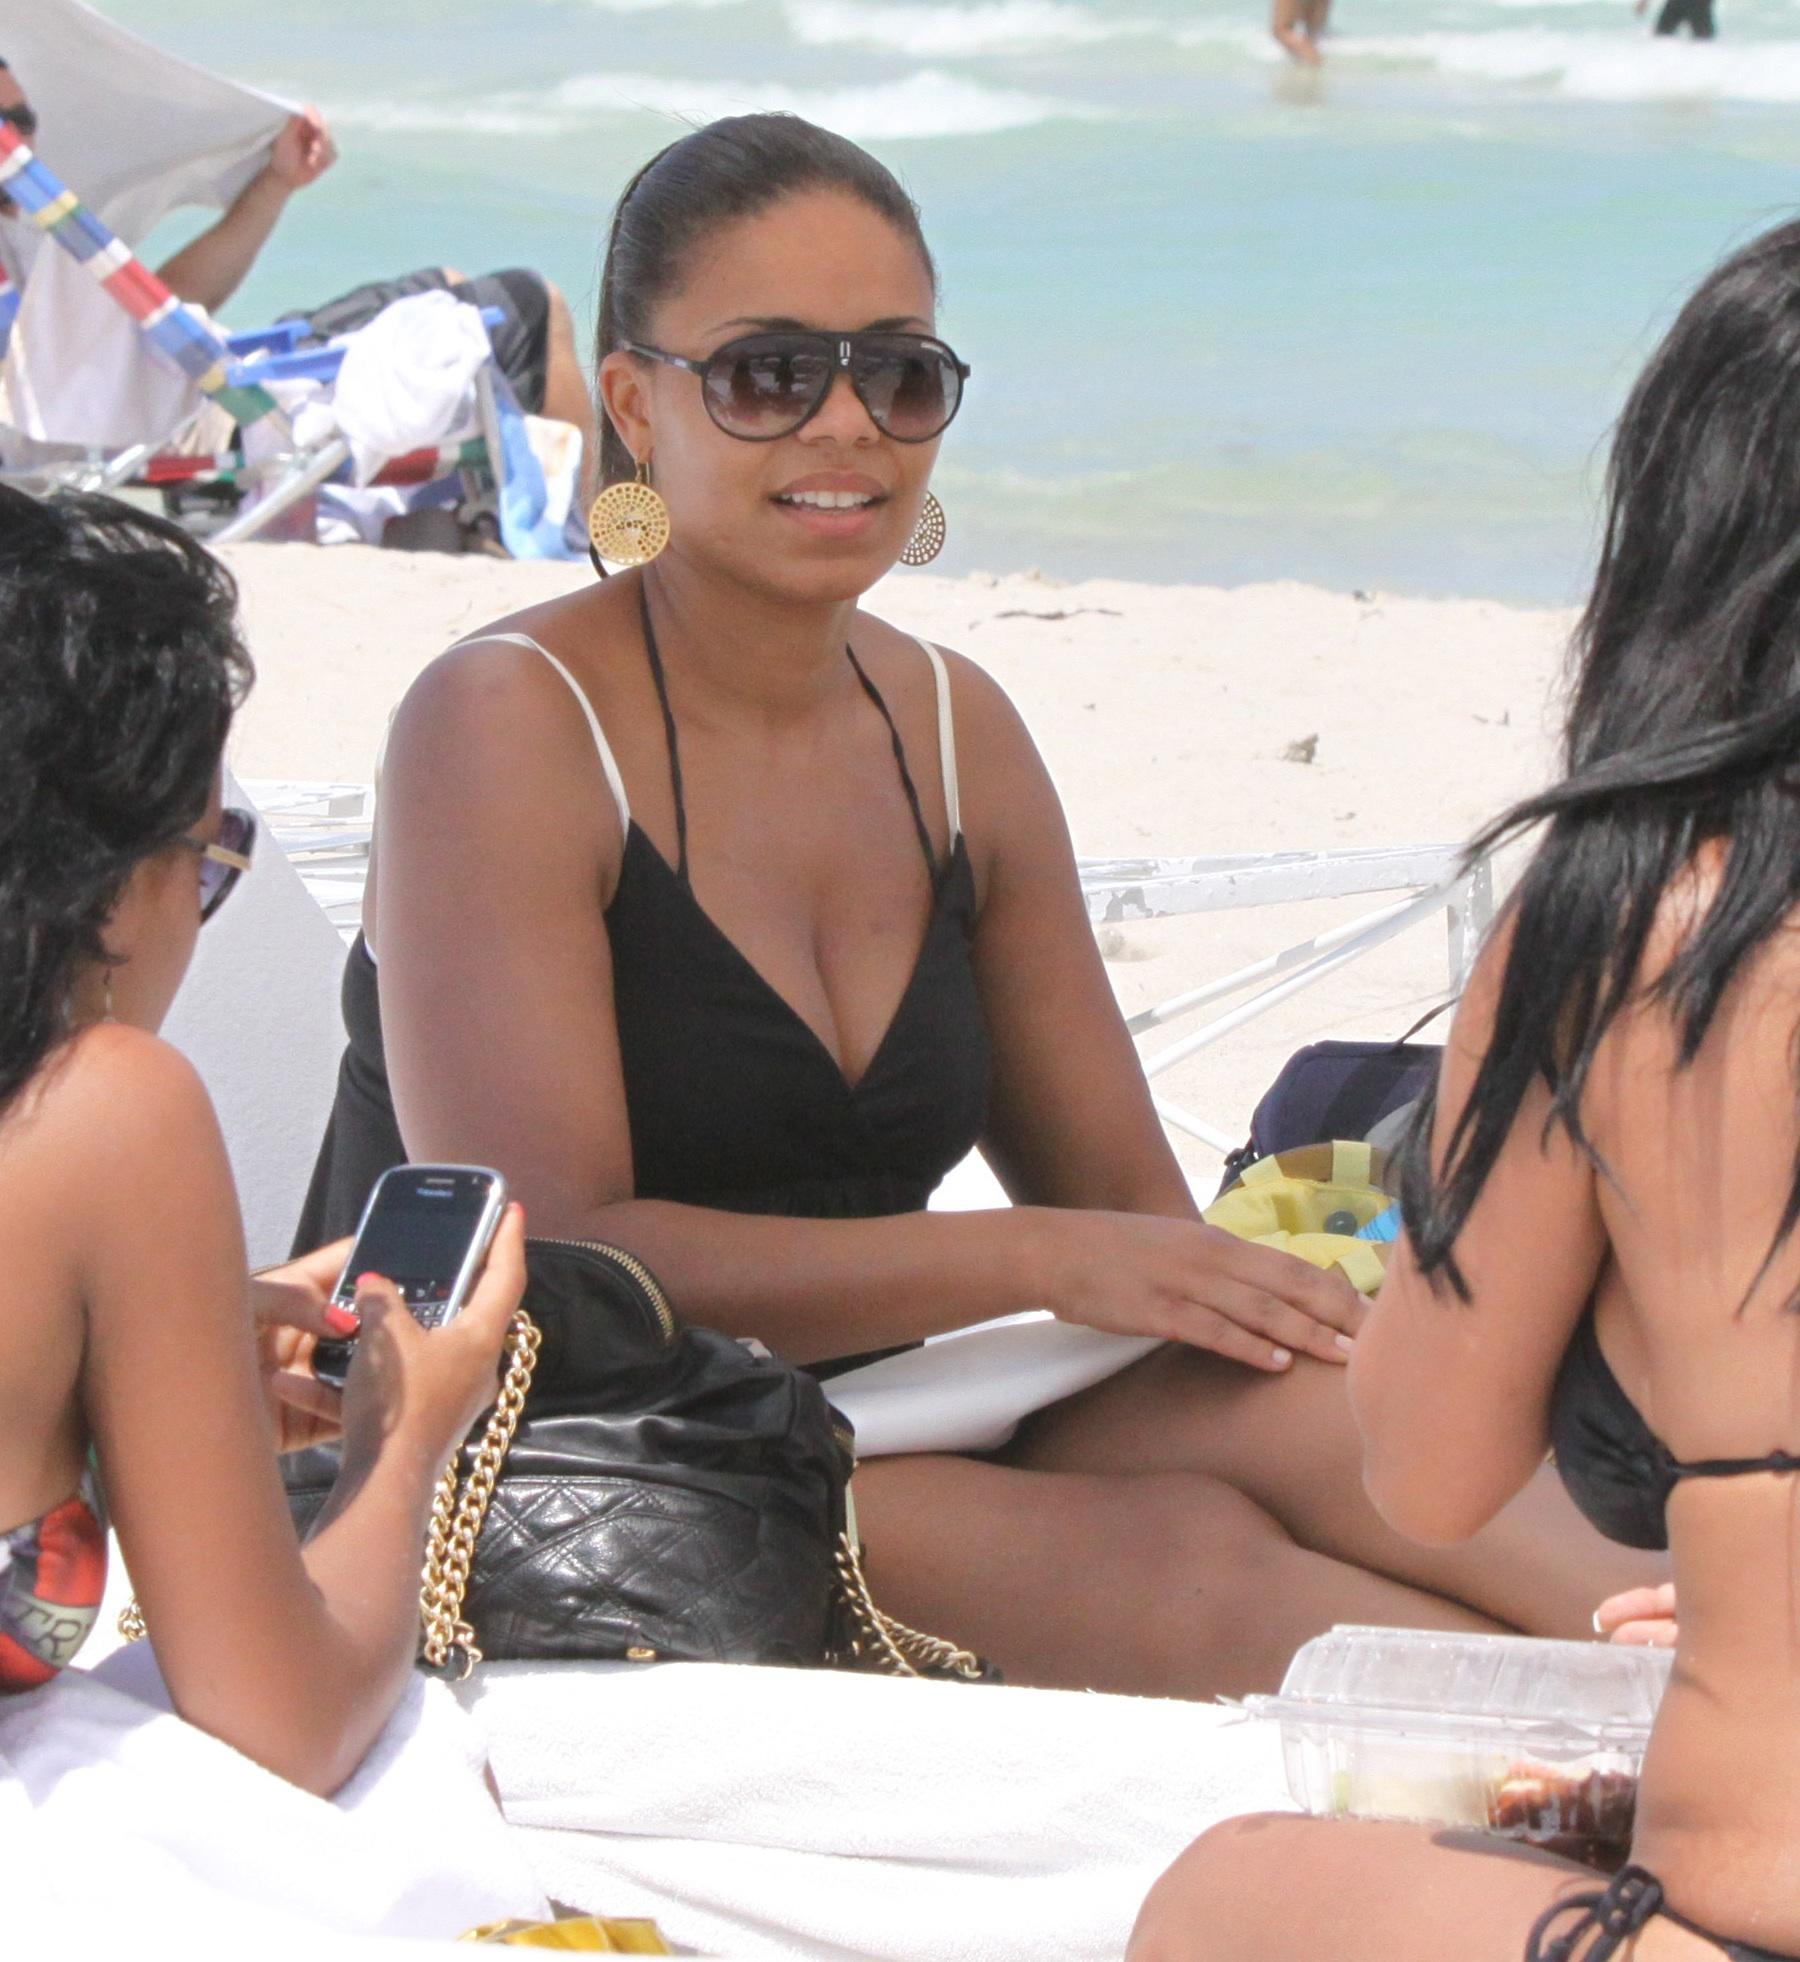 Bikini photos of sanaa lathan, download kerala girls hot nude images